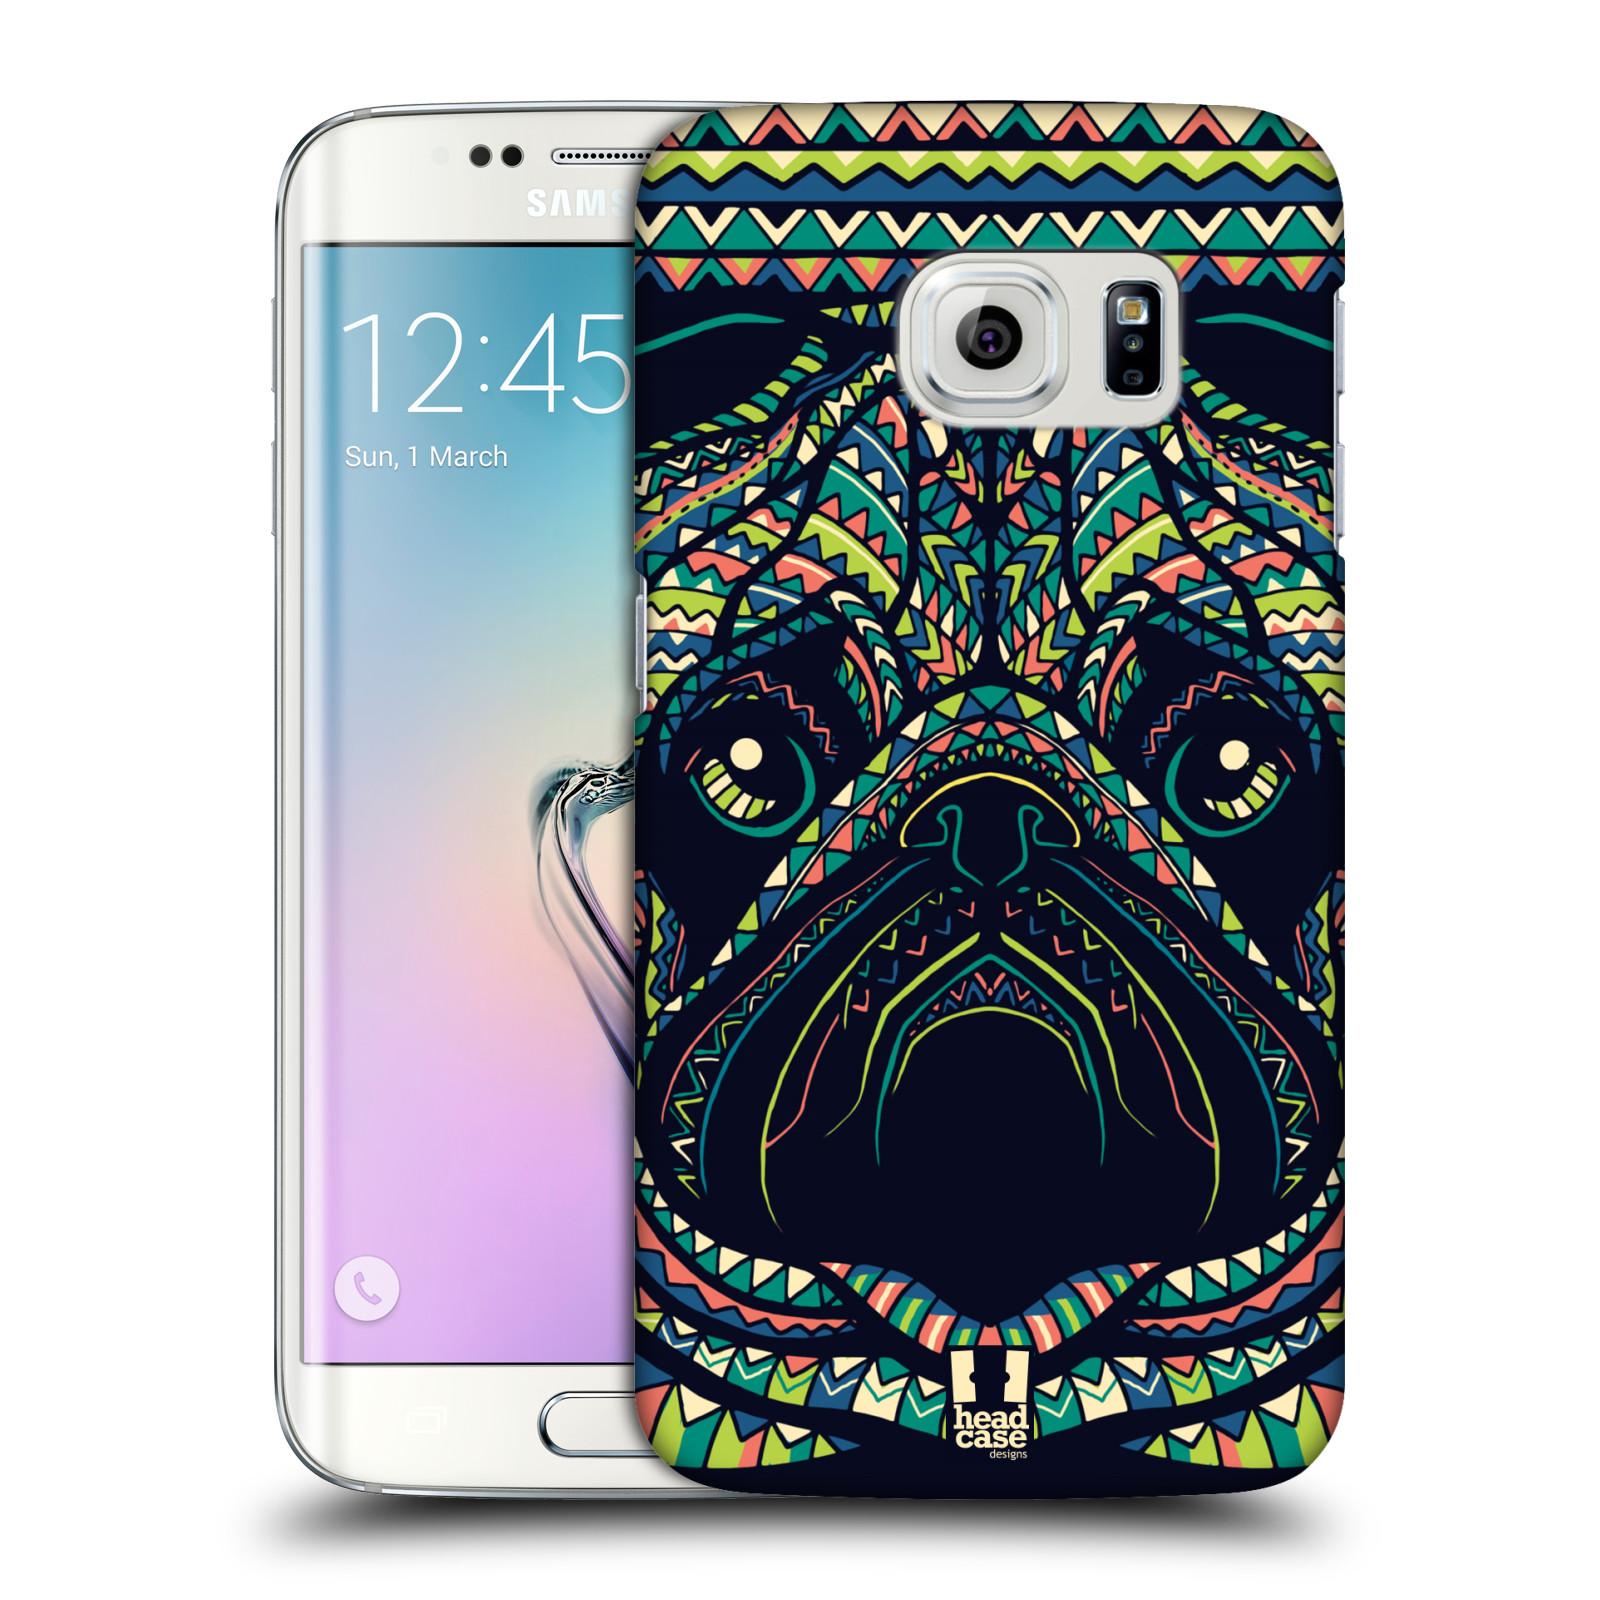 HEAD CASE plastový obal na mobil SAMSUNG Galaxy S6 EDGE (G9250, G925, G925F) vzor Aztécký motiv zvíře 3 mopsík